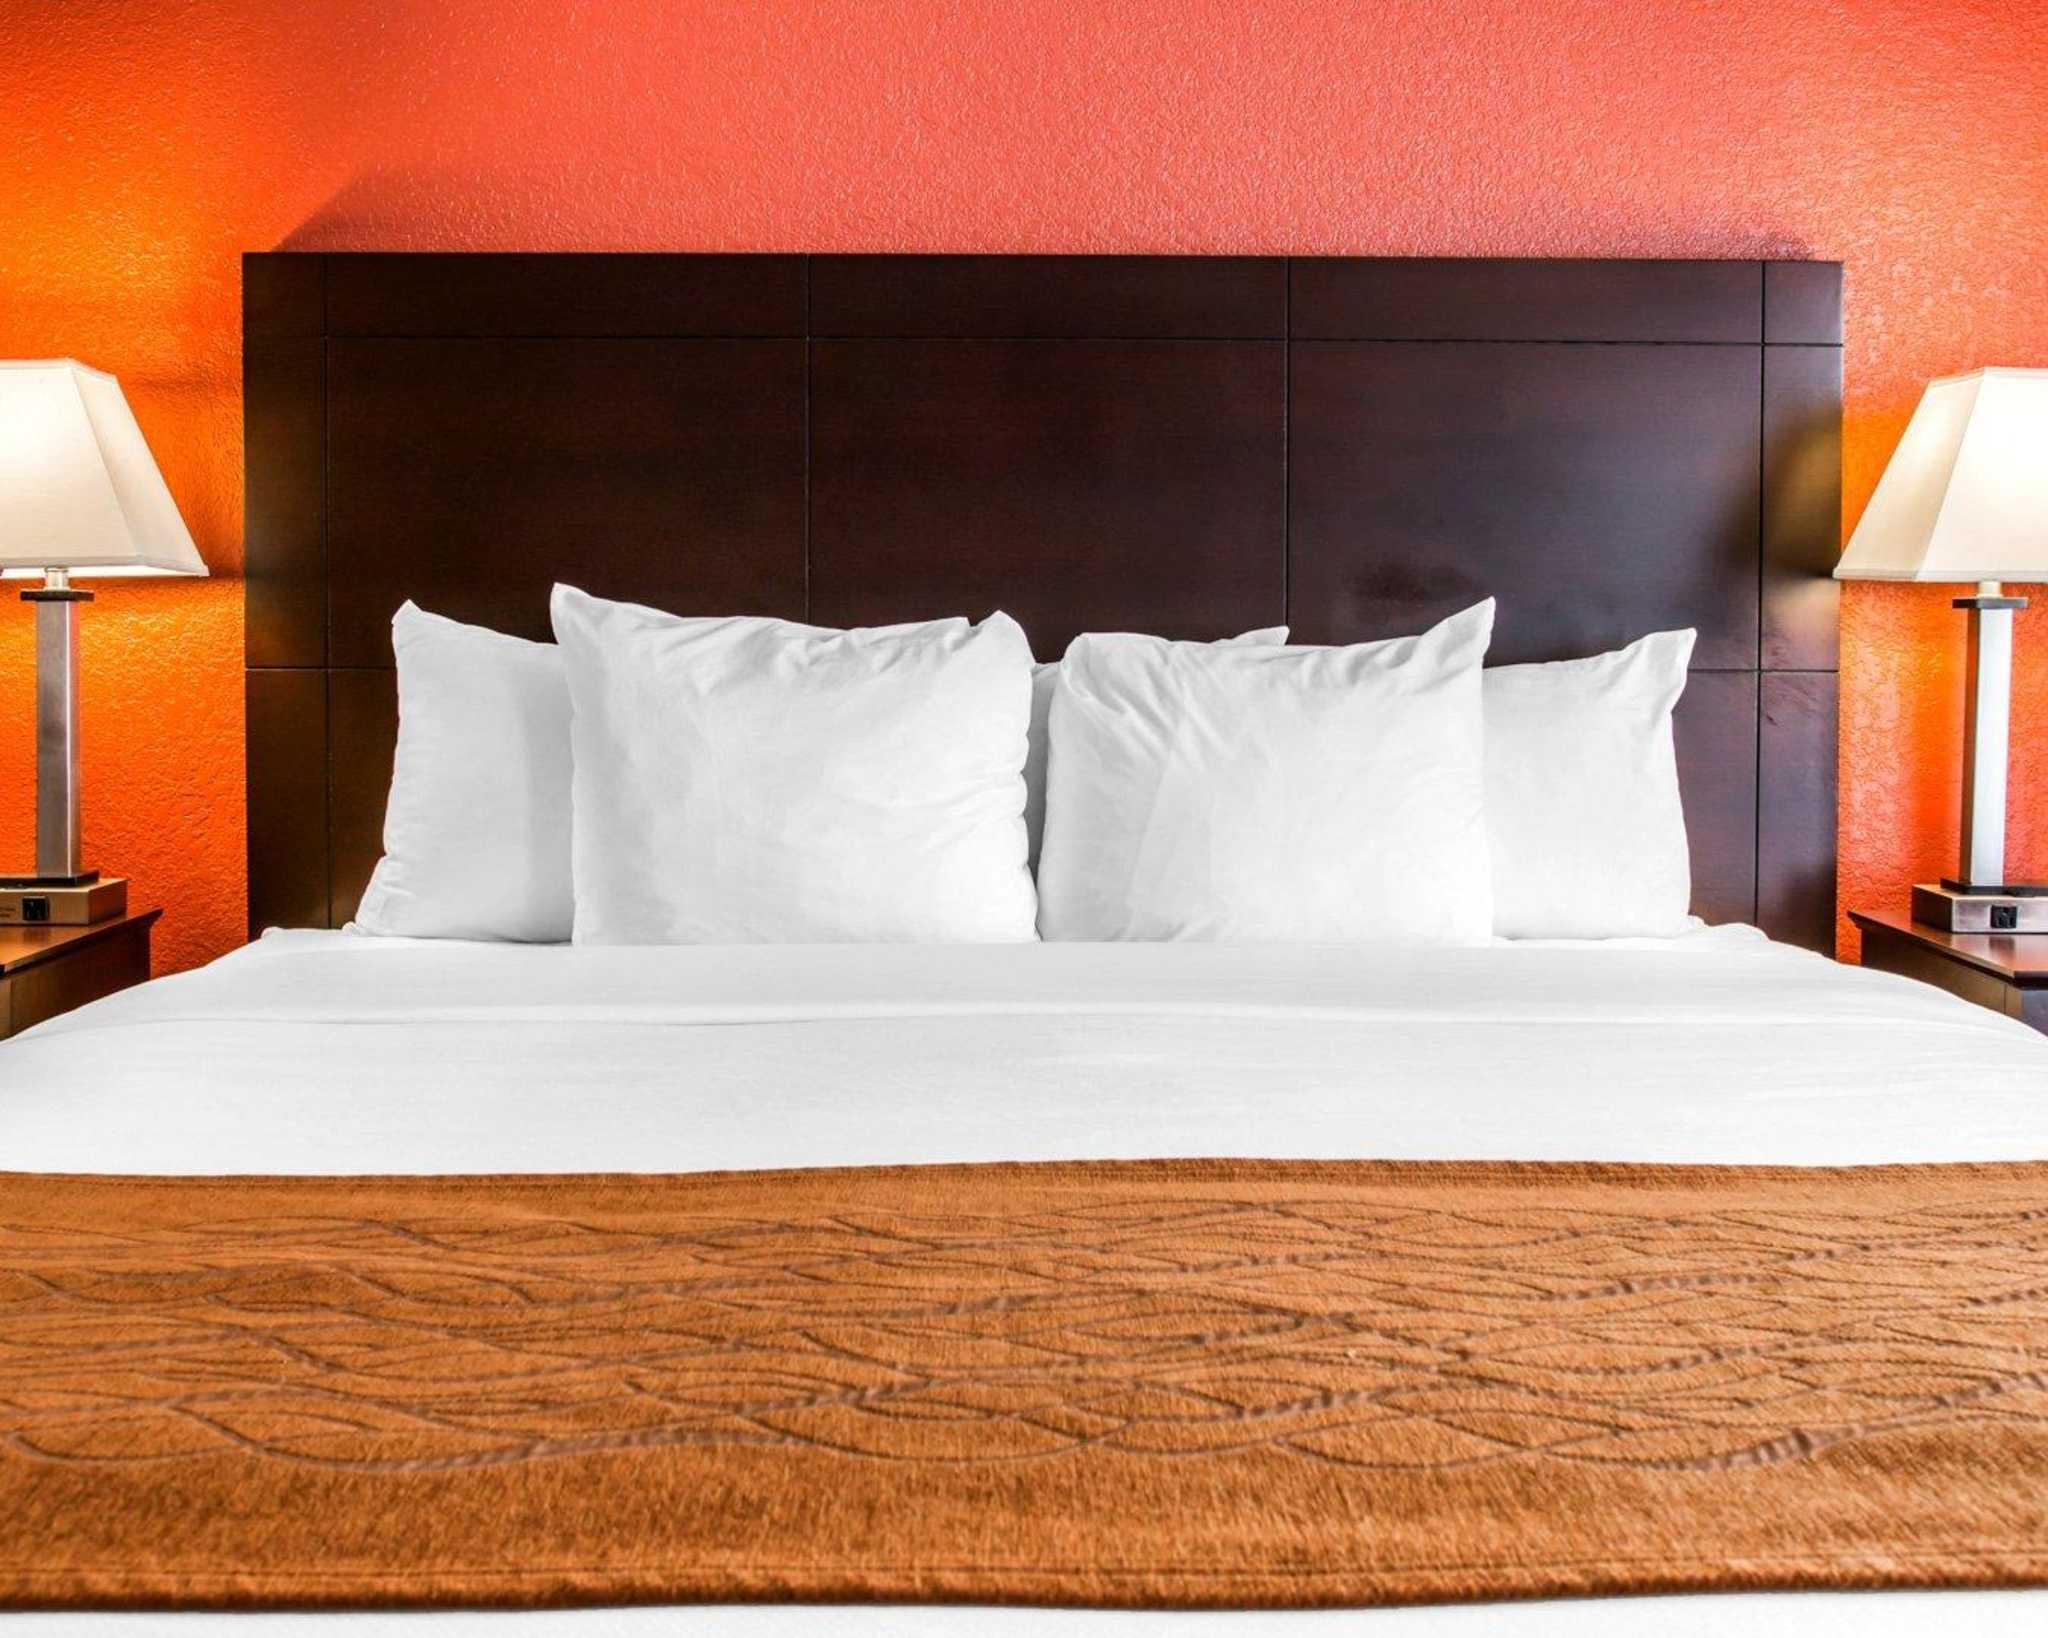 Schooner Room Casino Halifax  Sexually Correct